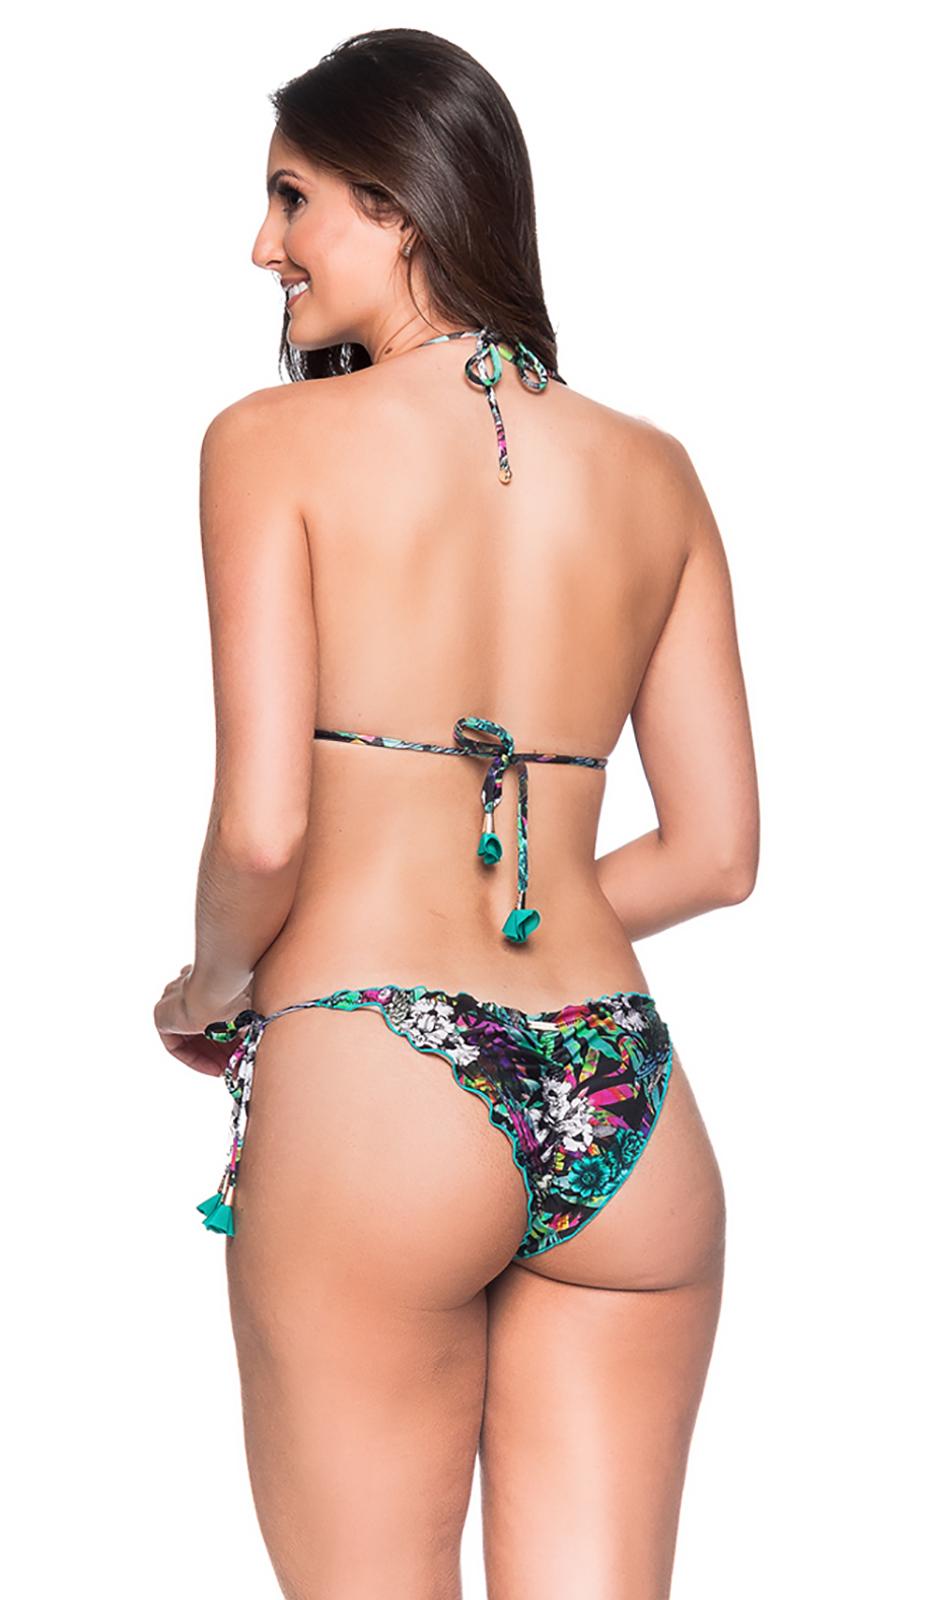 1ce975c420733 Colorful Floral Scrunch Bikini With Pompons - Ripple Atalaia - La Playa